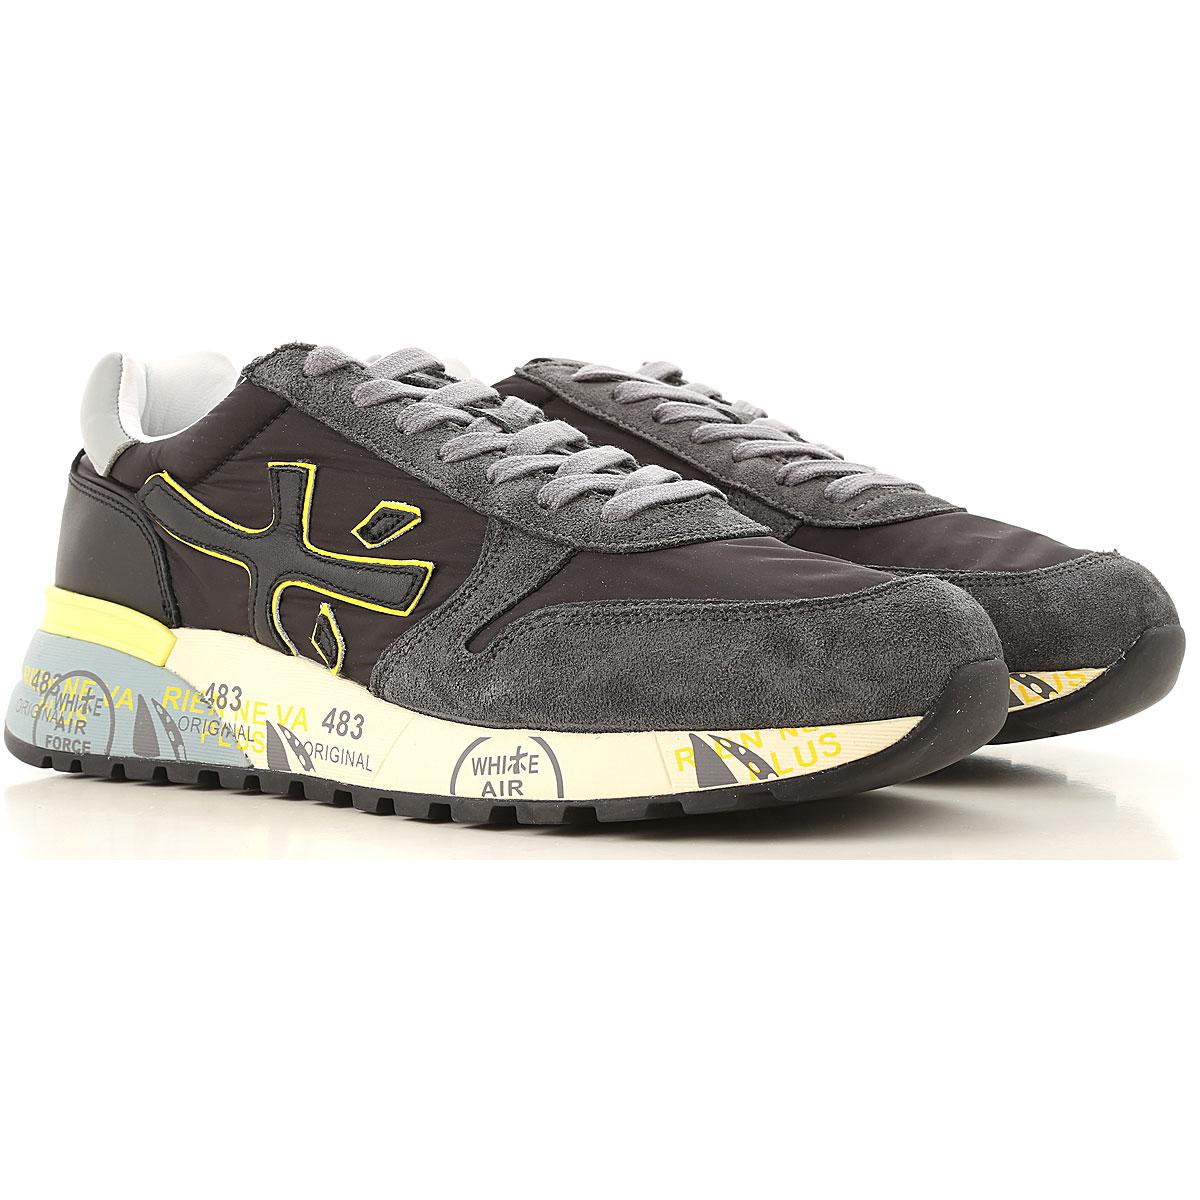 Premiata Sneakers for Men, Black, Leather, 2019, 10 10.5 7.5 8 9